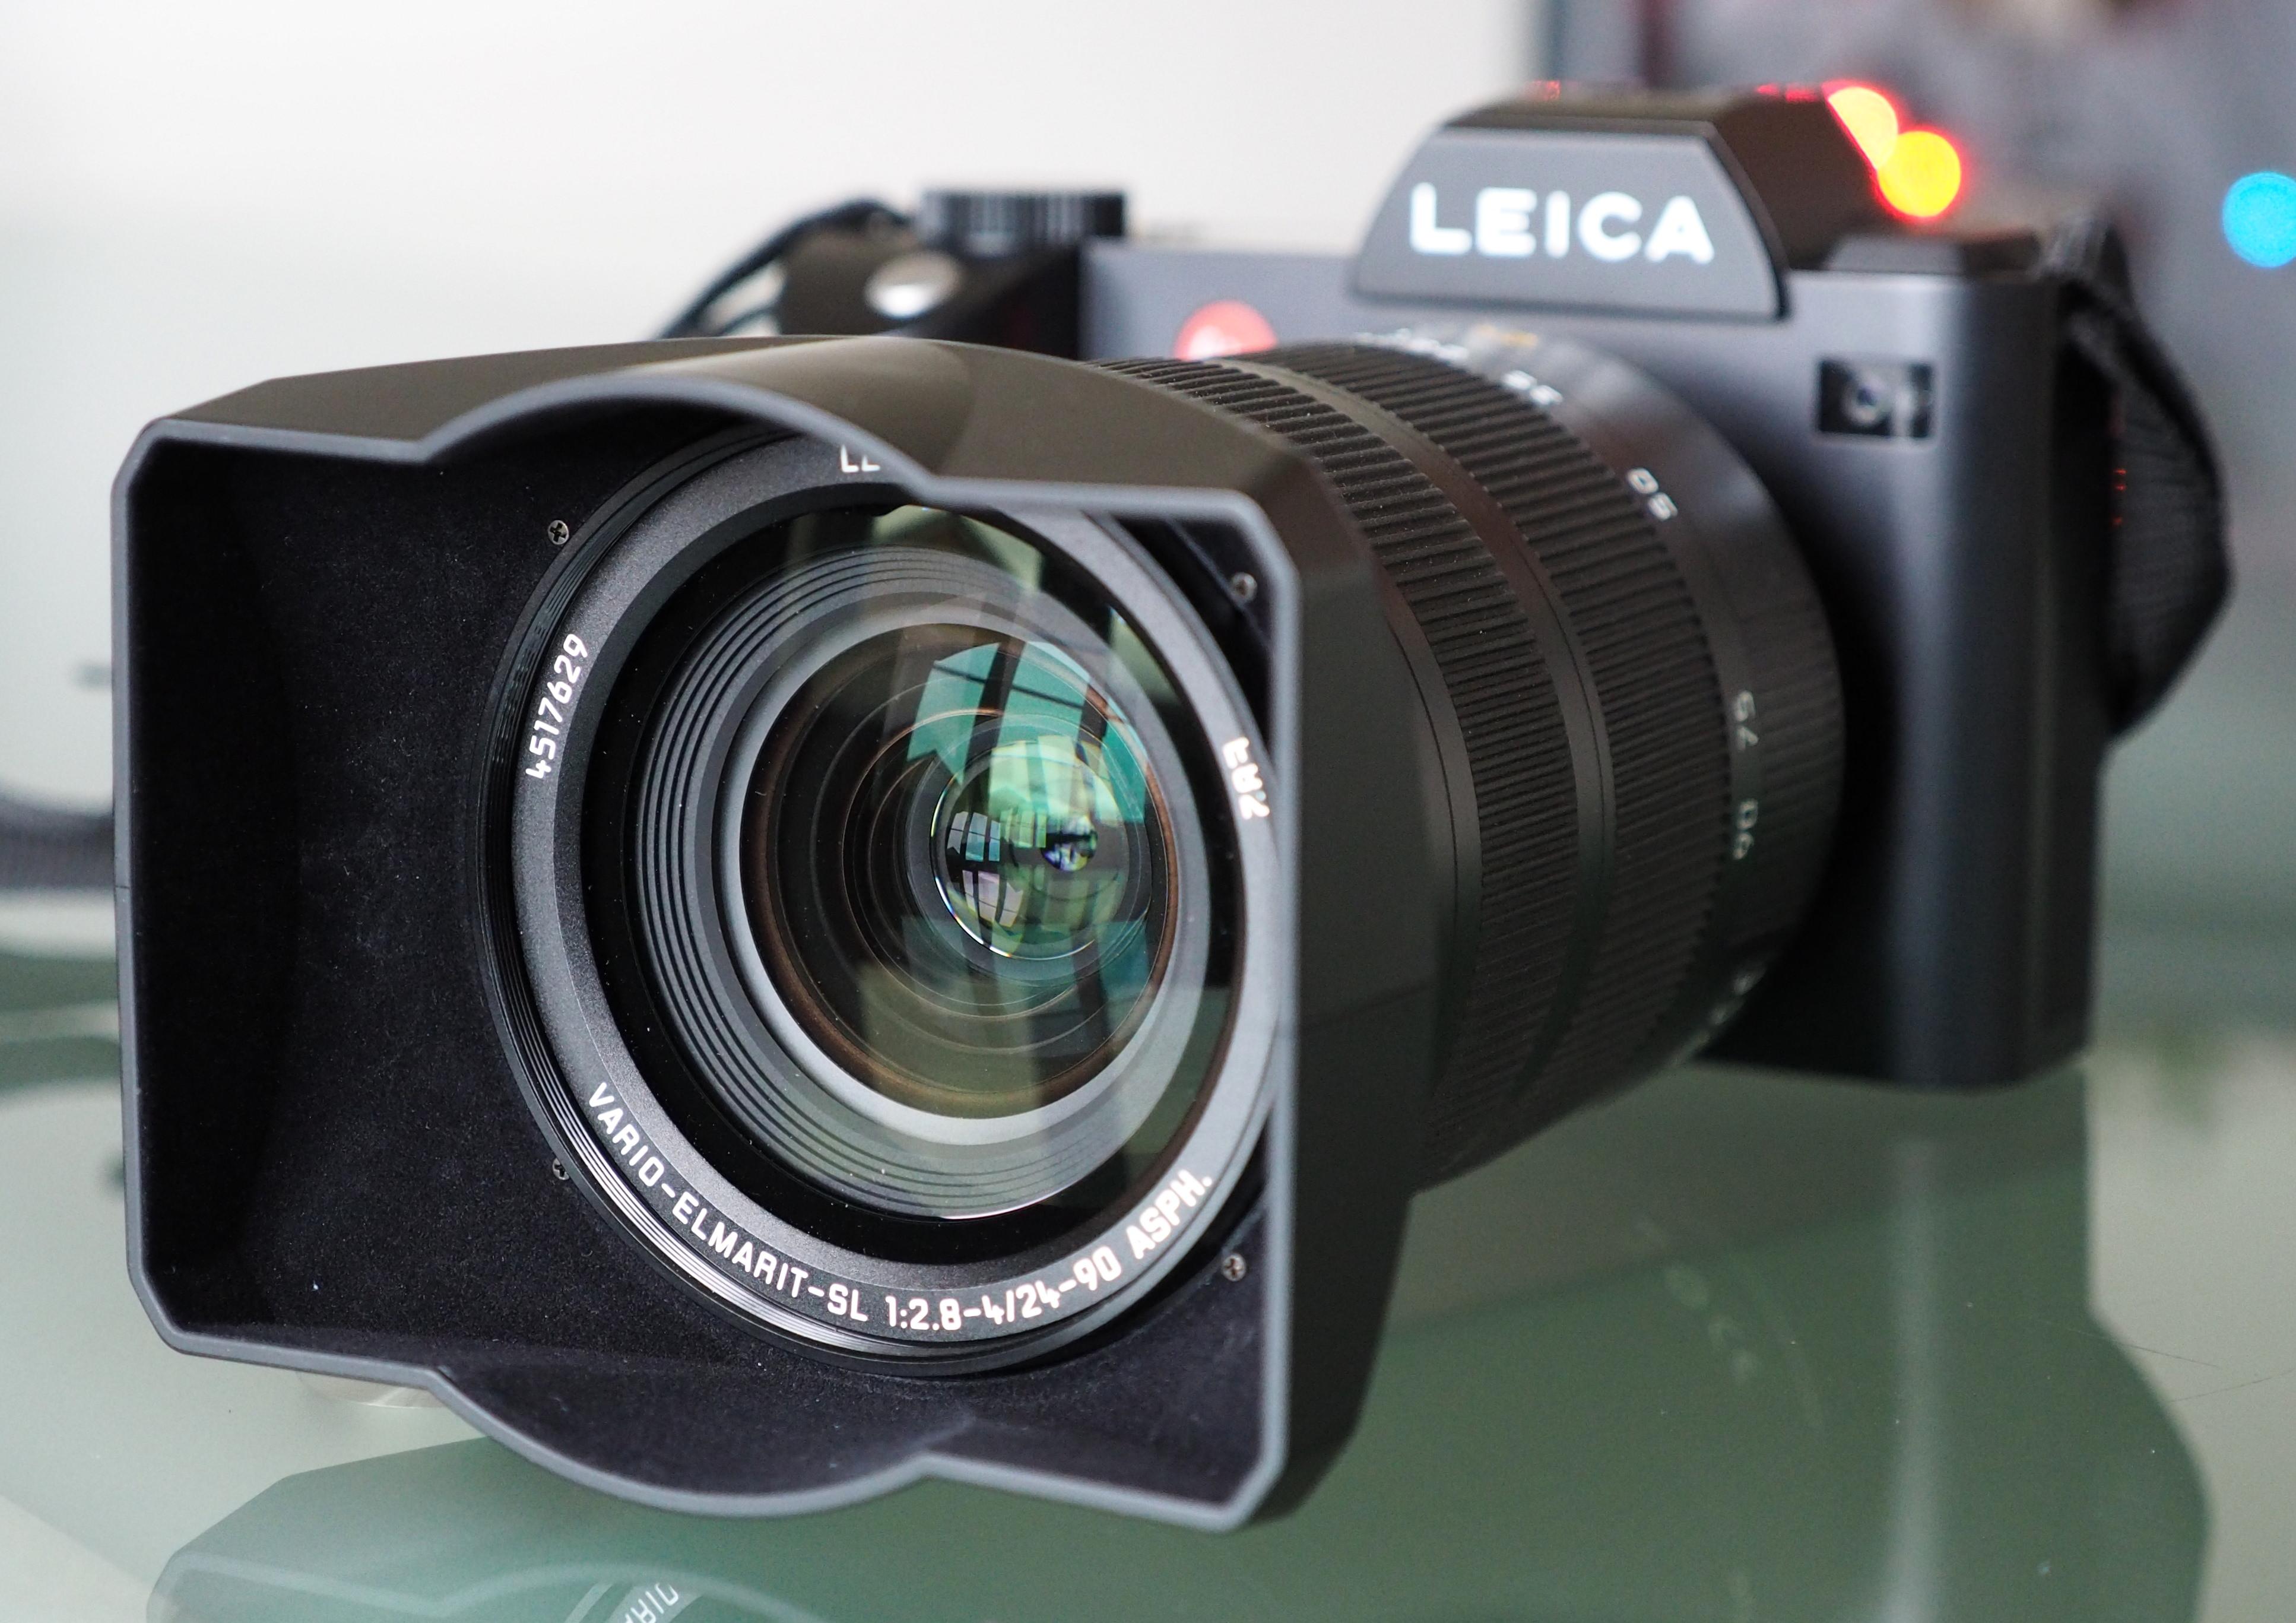 Leica SL (Typ 601) Camera Windows 8 X64 Driver Download